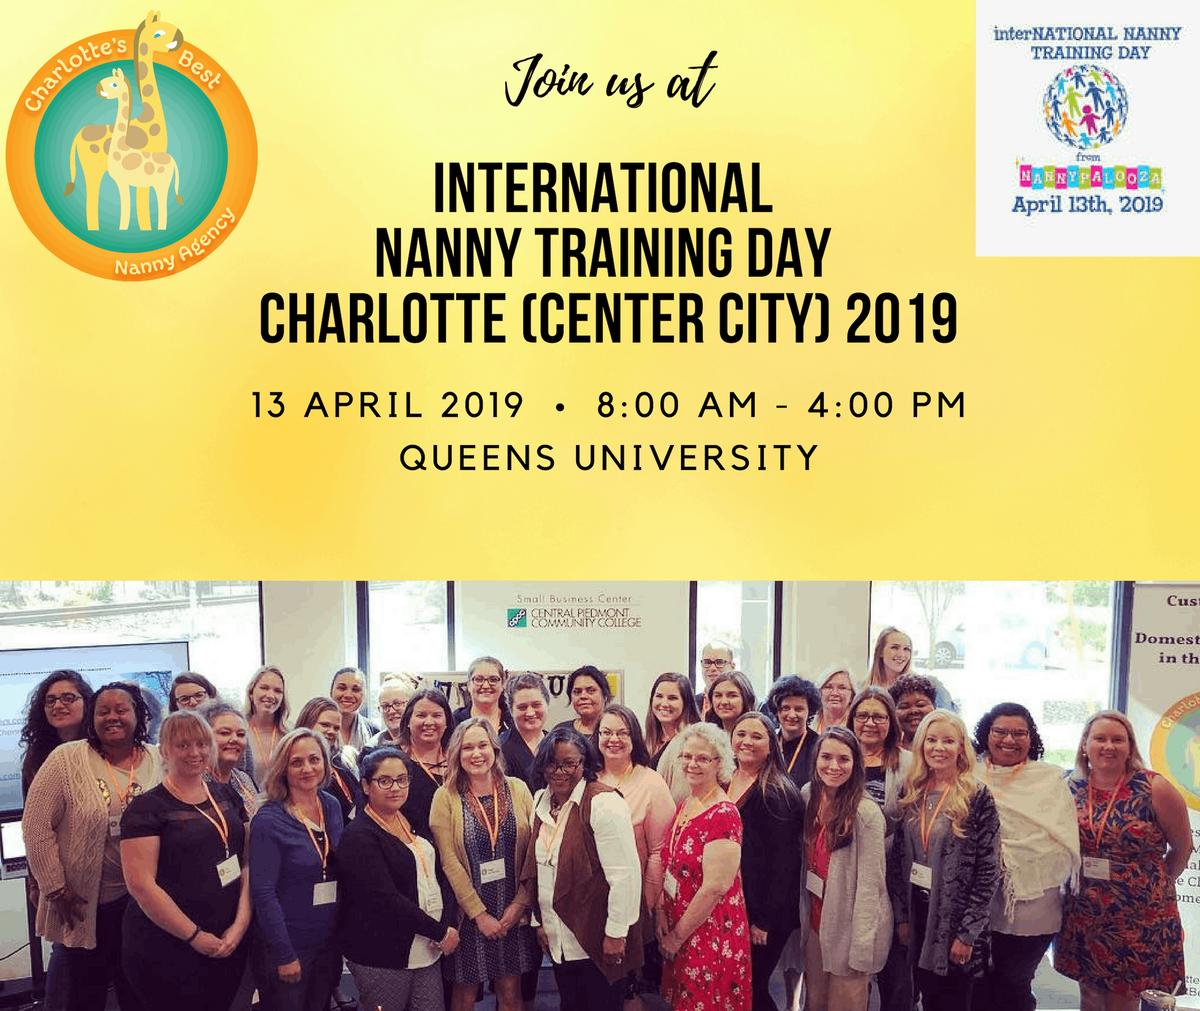 International Nanny Training Day Charlotte (Center City) 2019